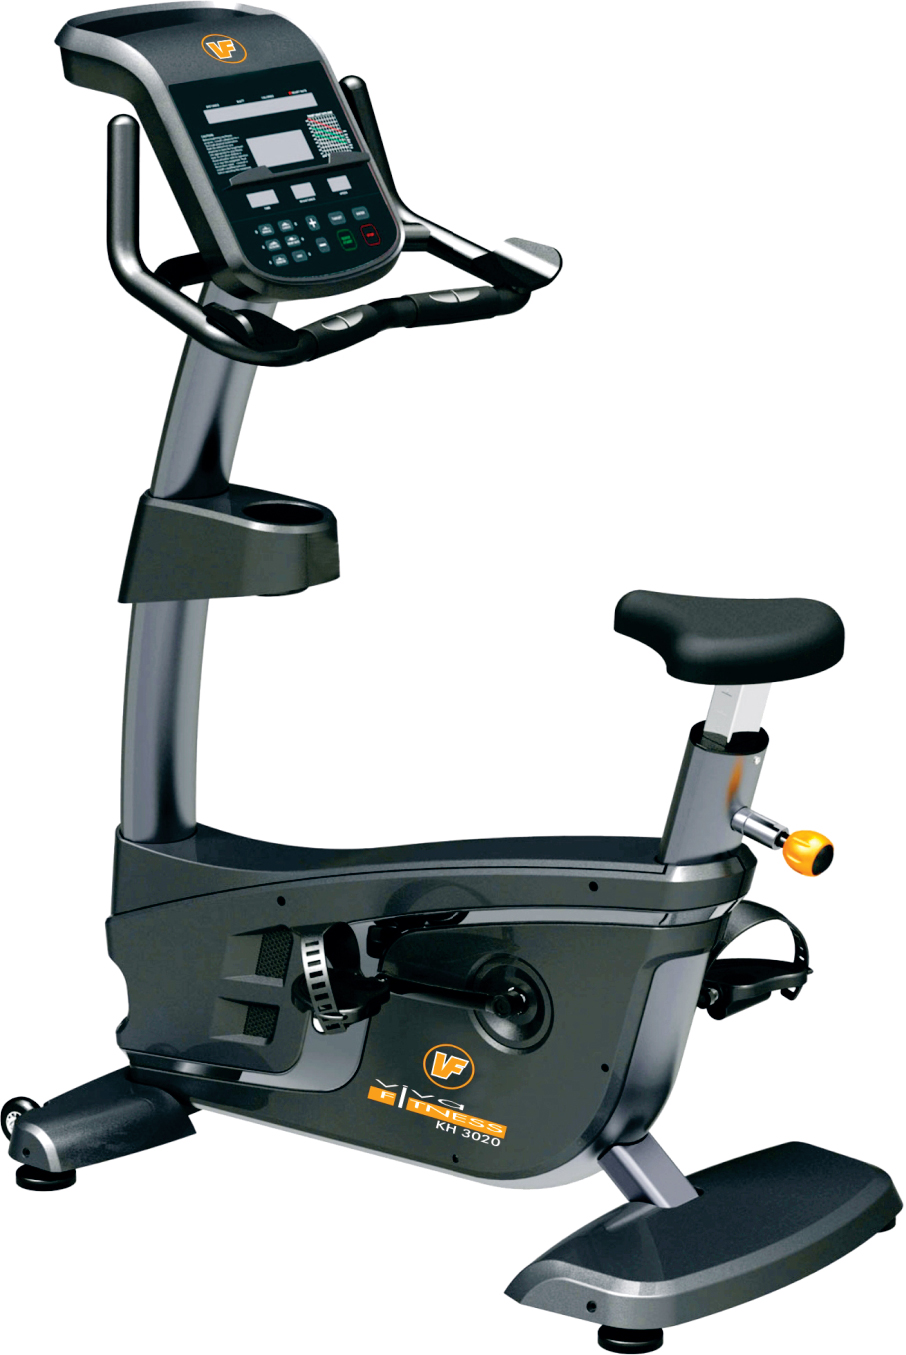 KH-3020 Commercial Upright Bike